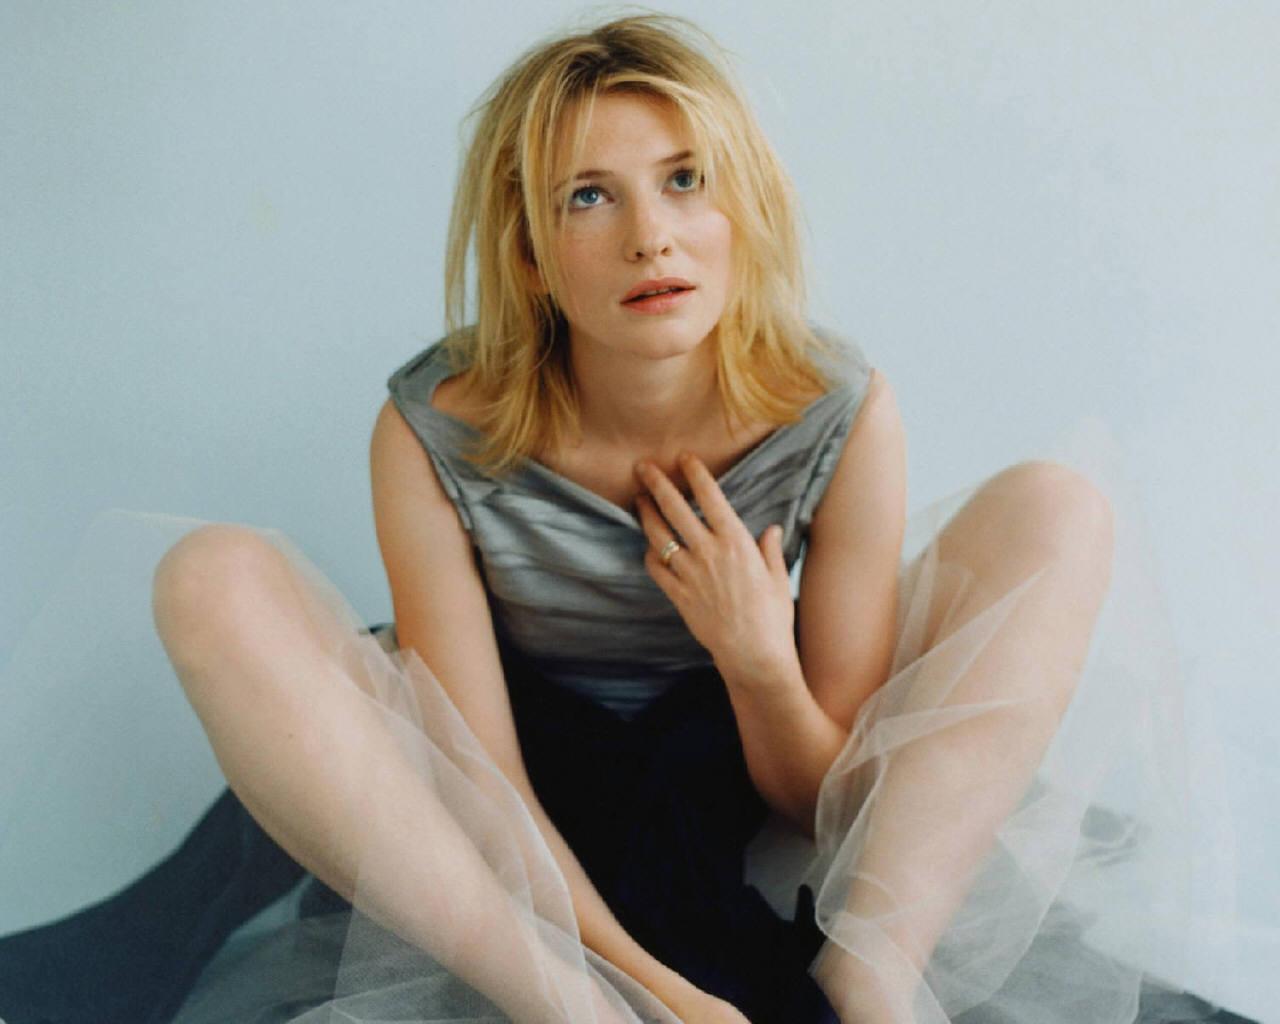 Kejt Blanšet - Page 2 Cate-Blanchett-cate-blanchett-222497_1280_1024